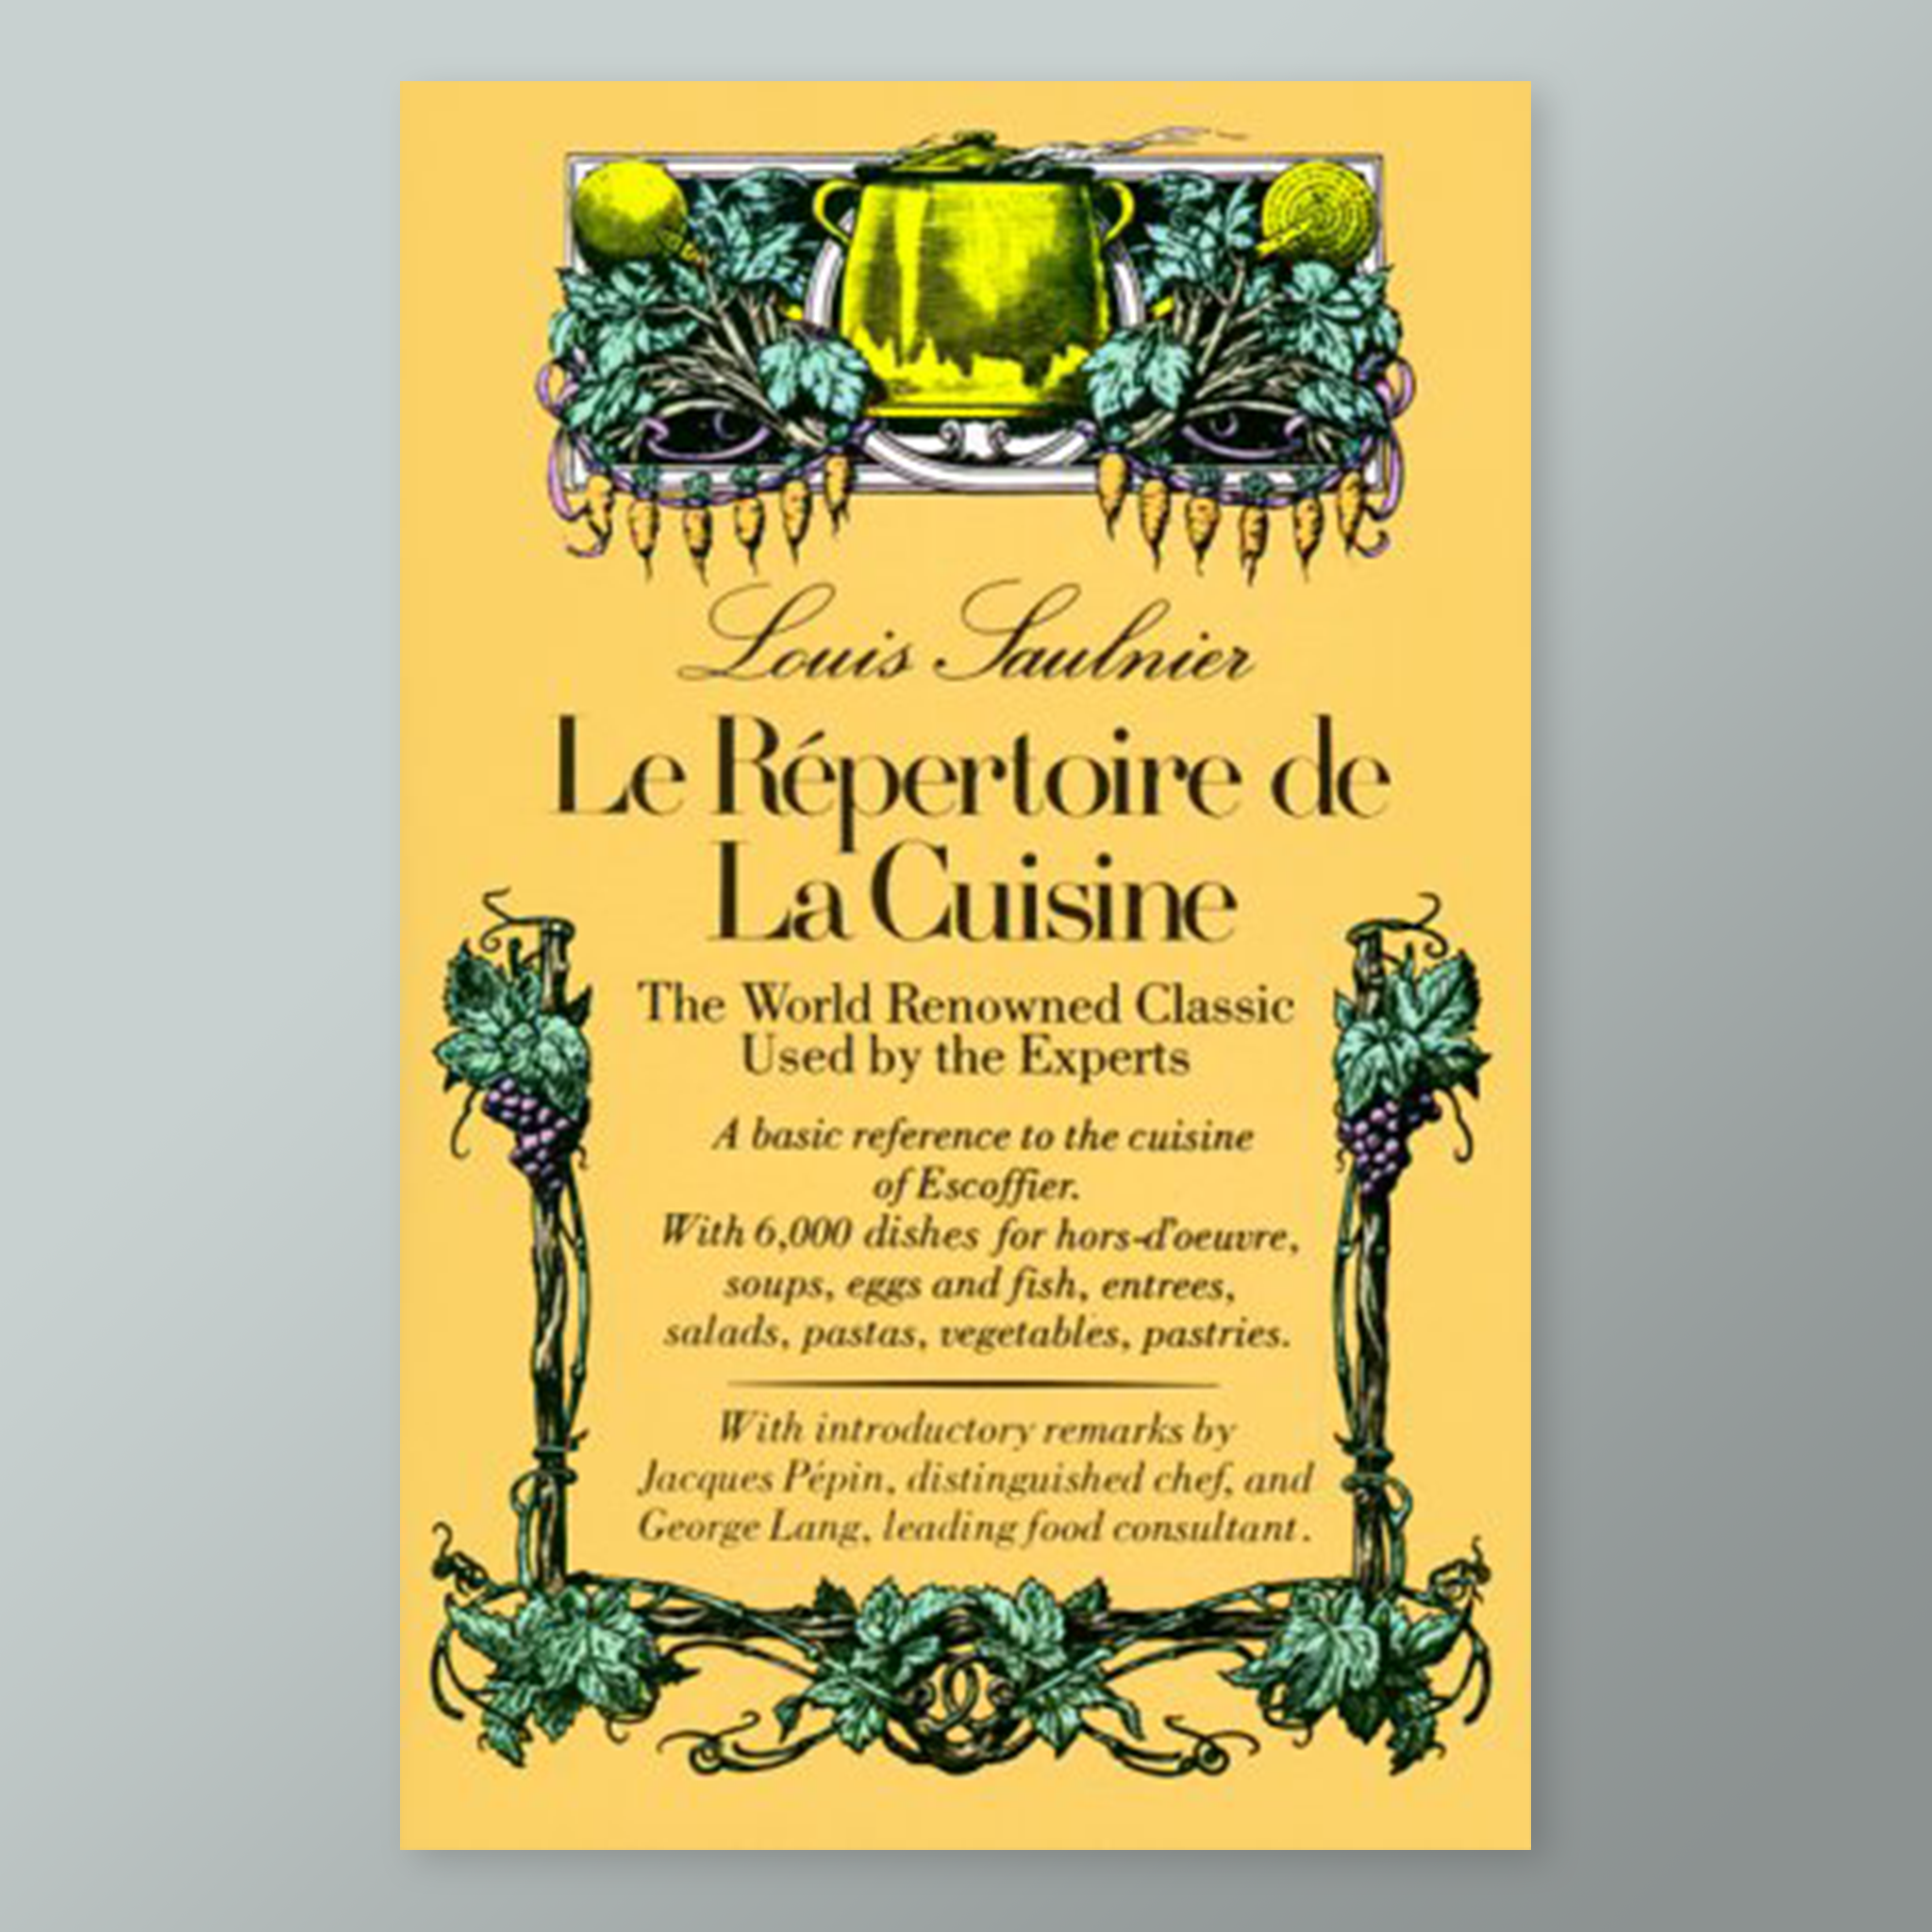 Le Repertoire de La Cuisine cookbook